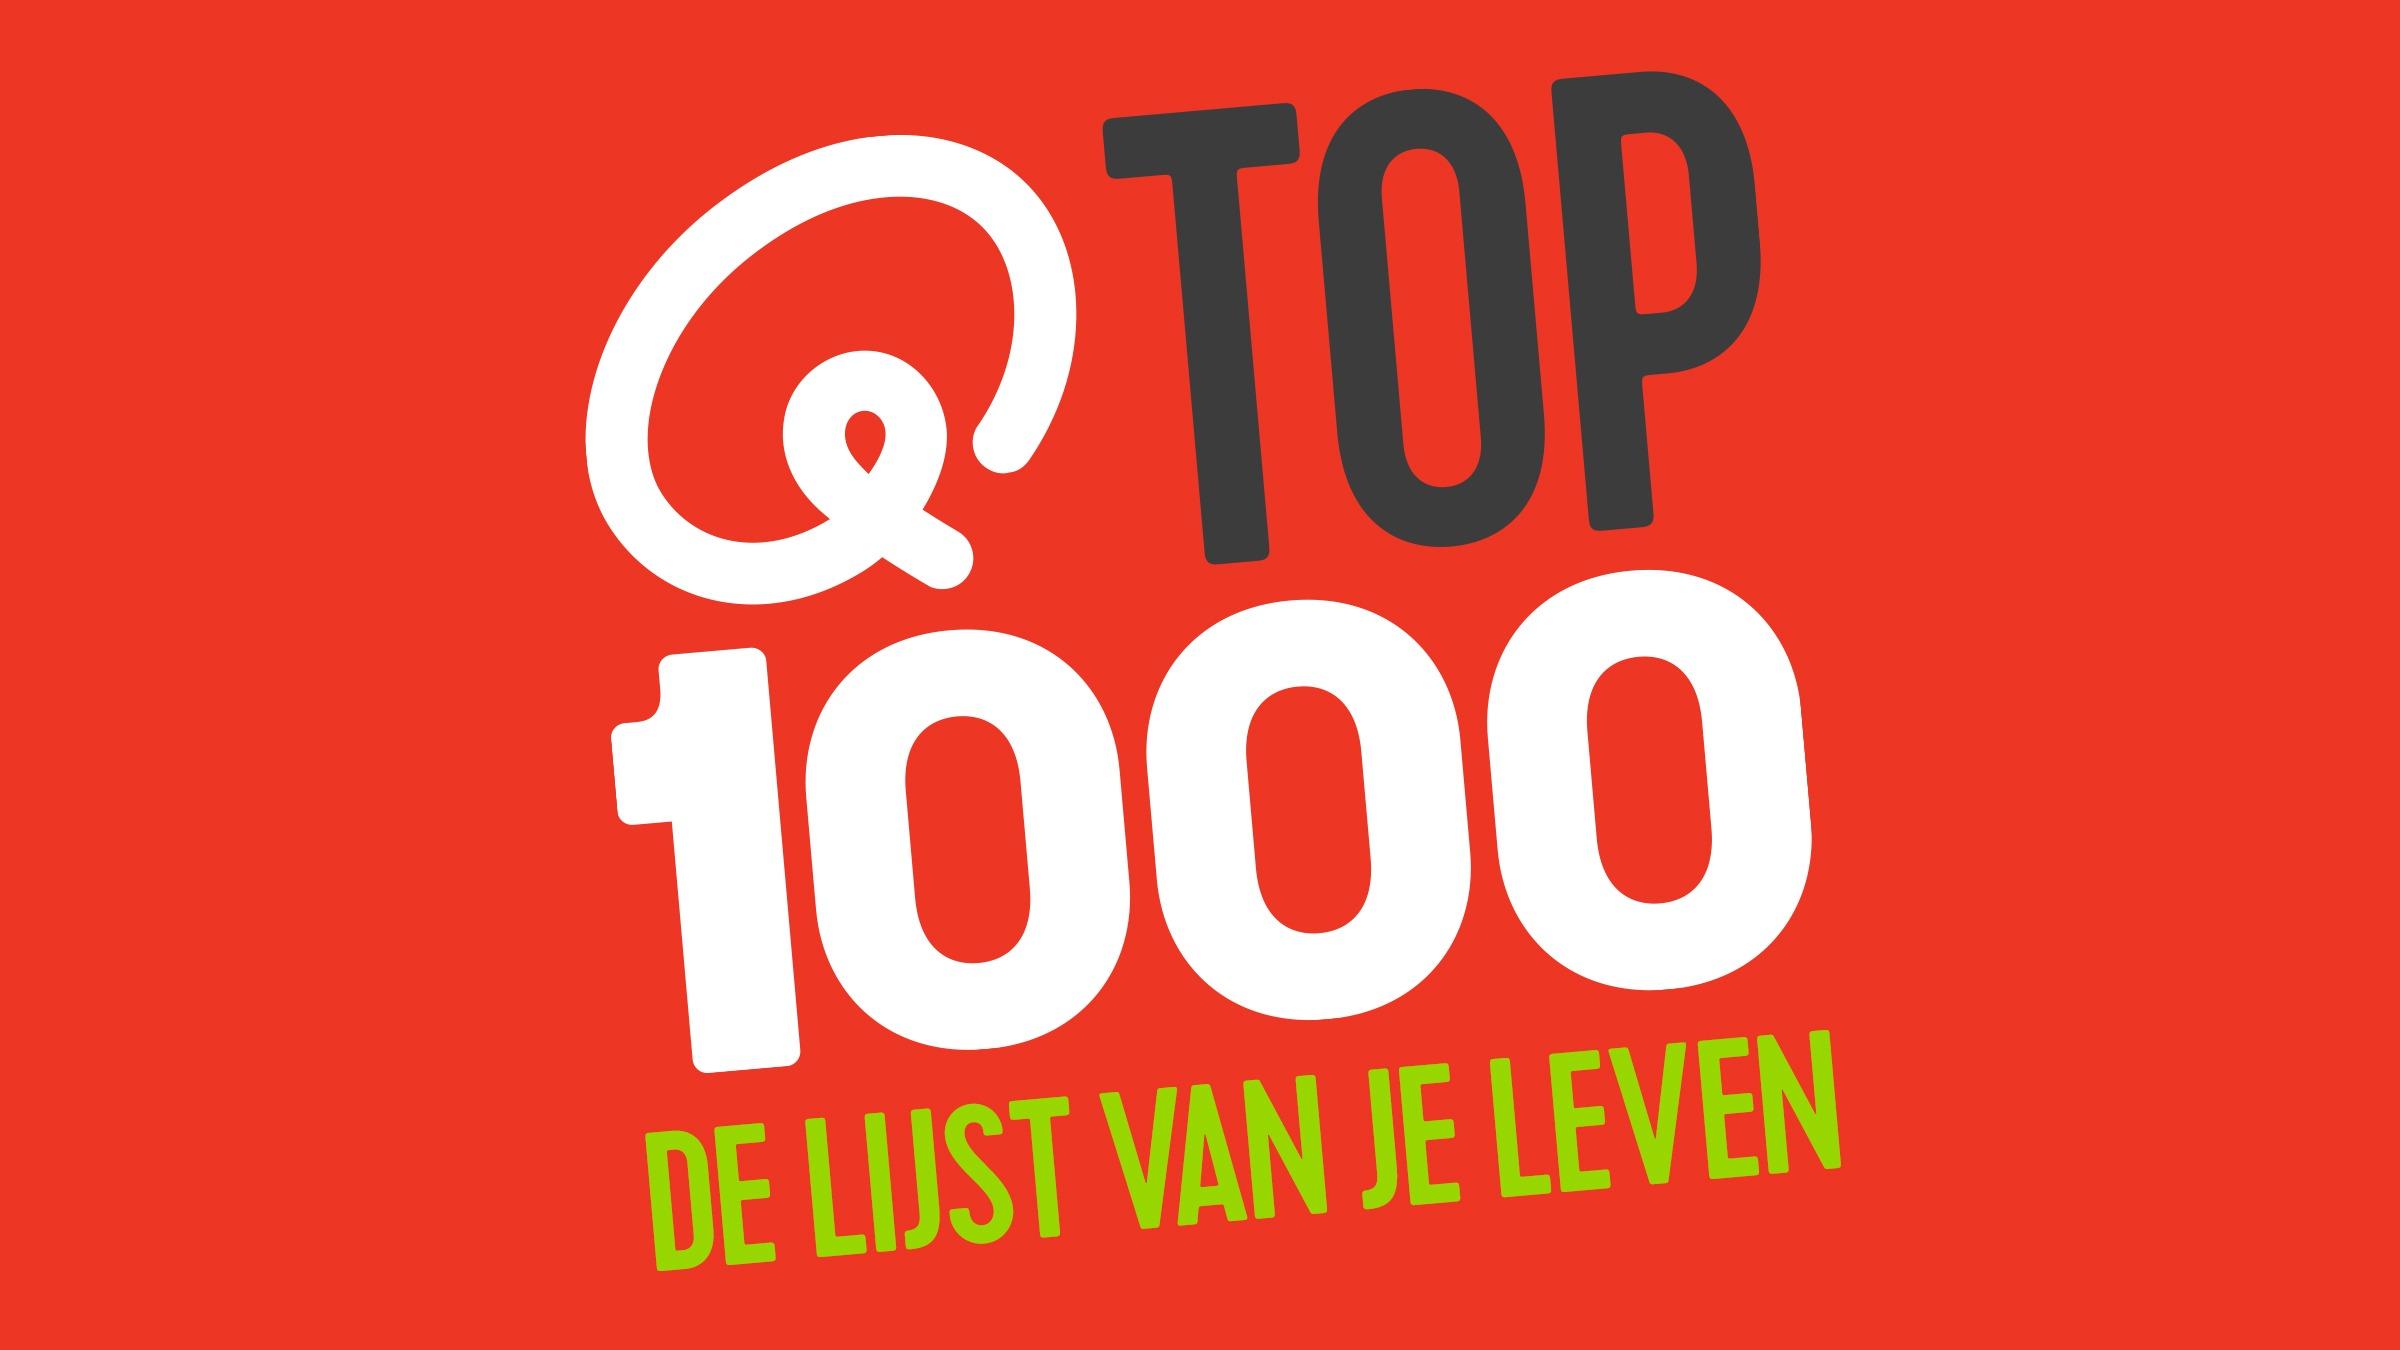 Qmusic teaser qtop1000  1